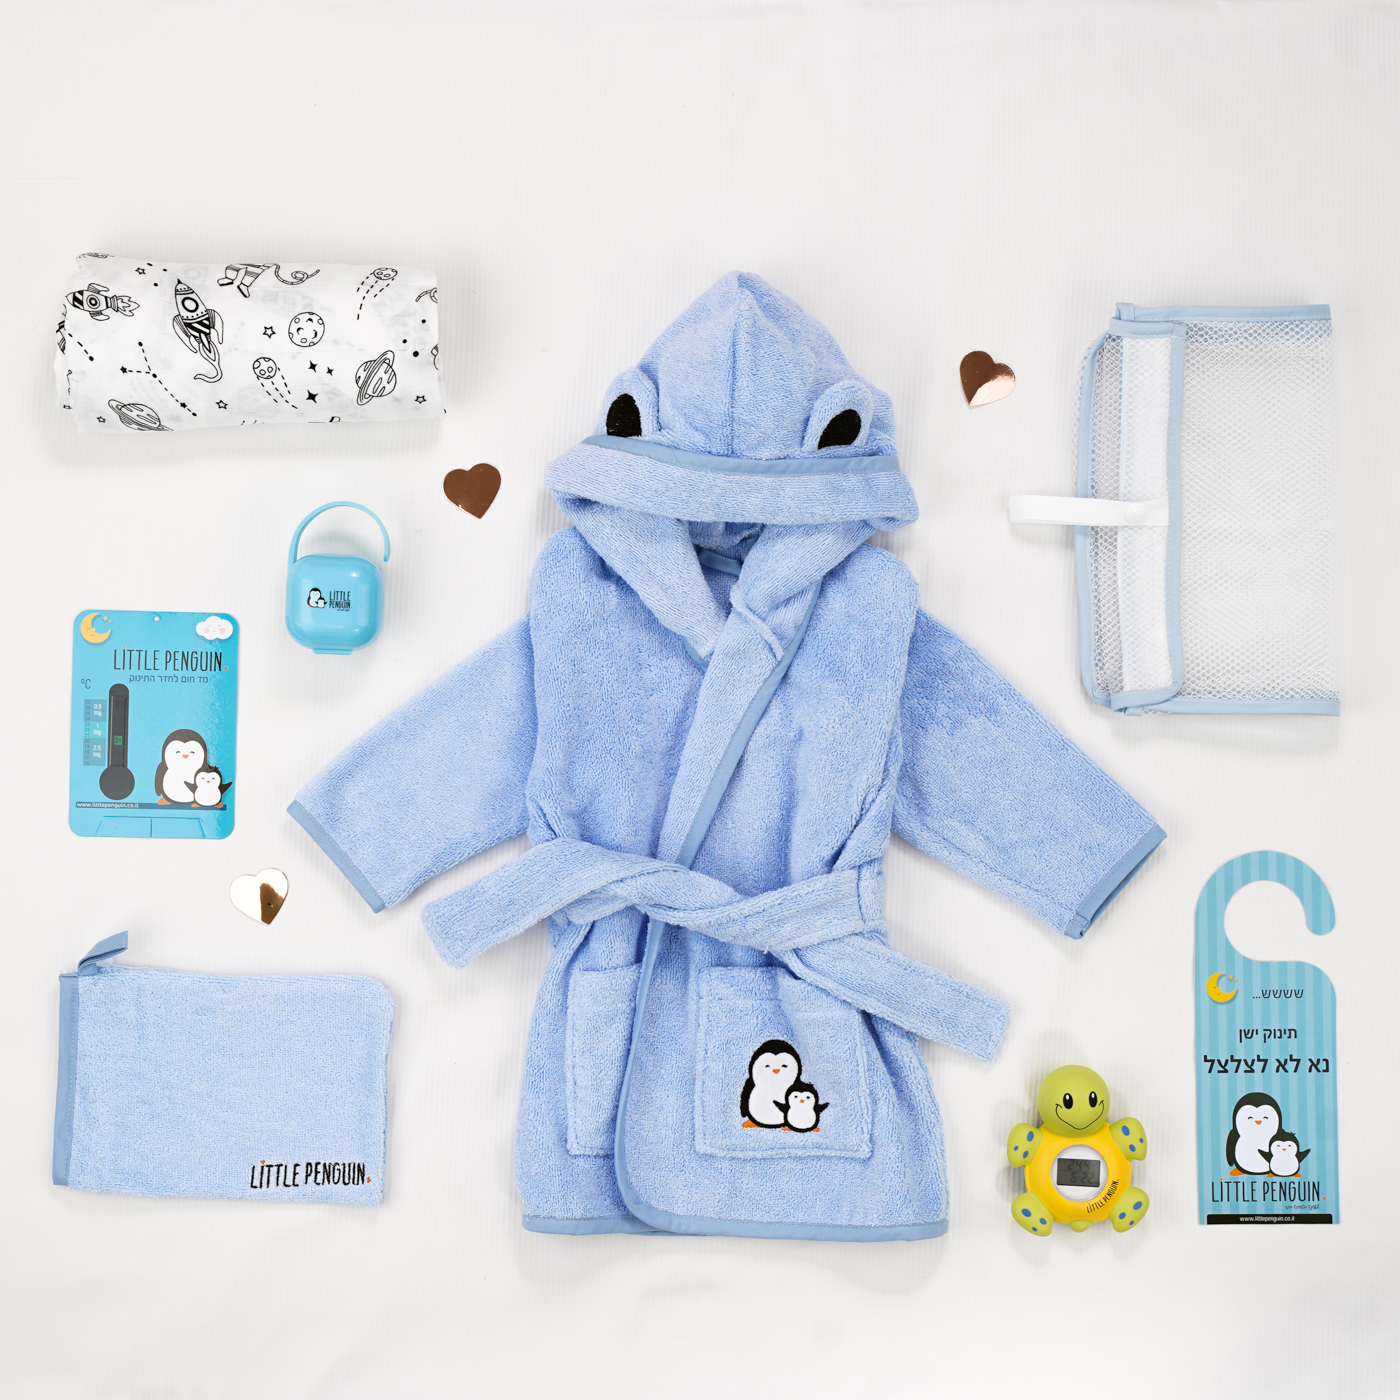 Bubbles and cuddles - Bathrobe gift set